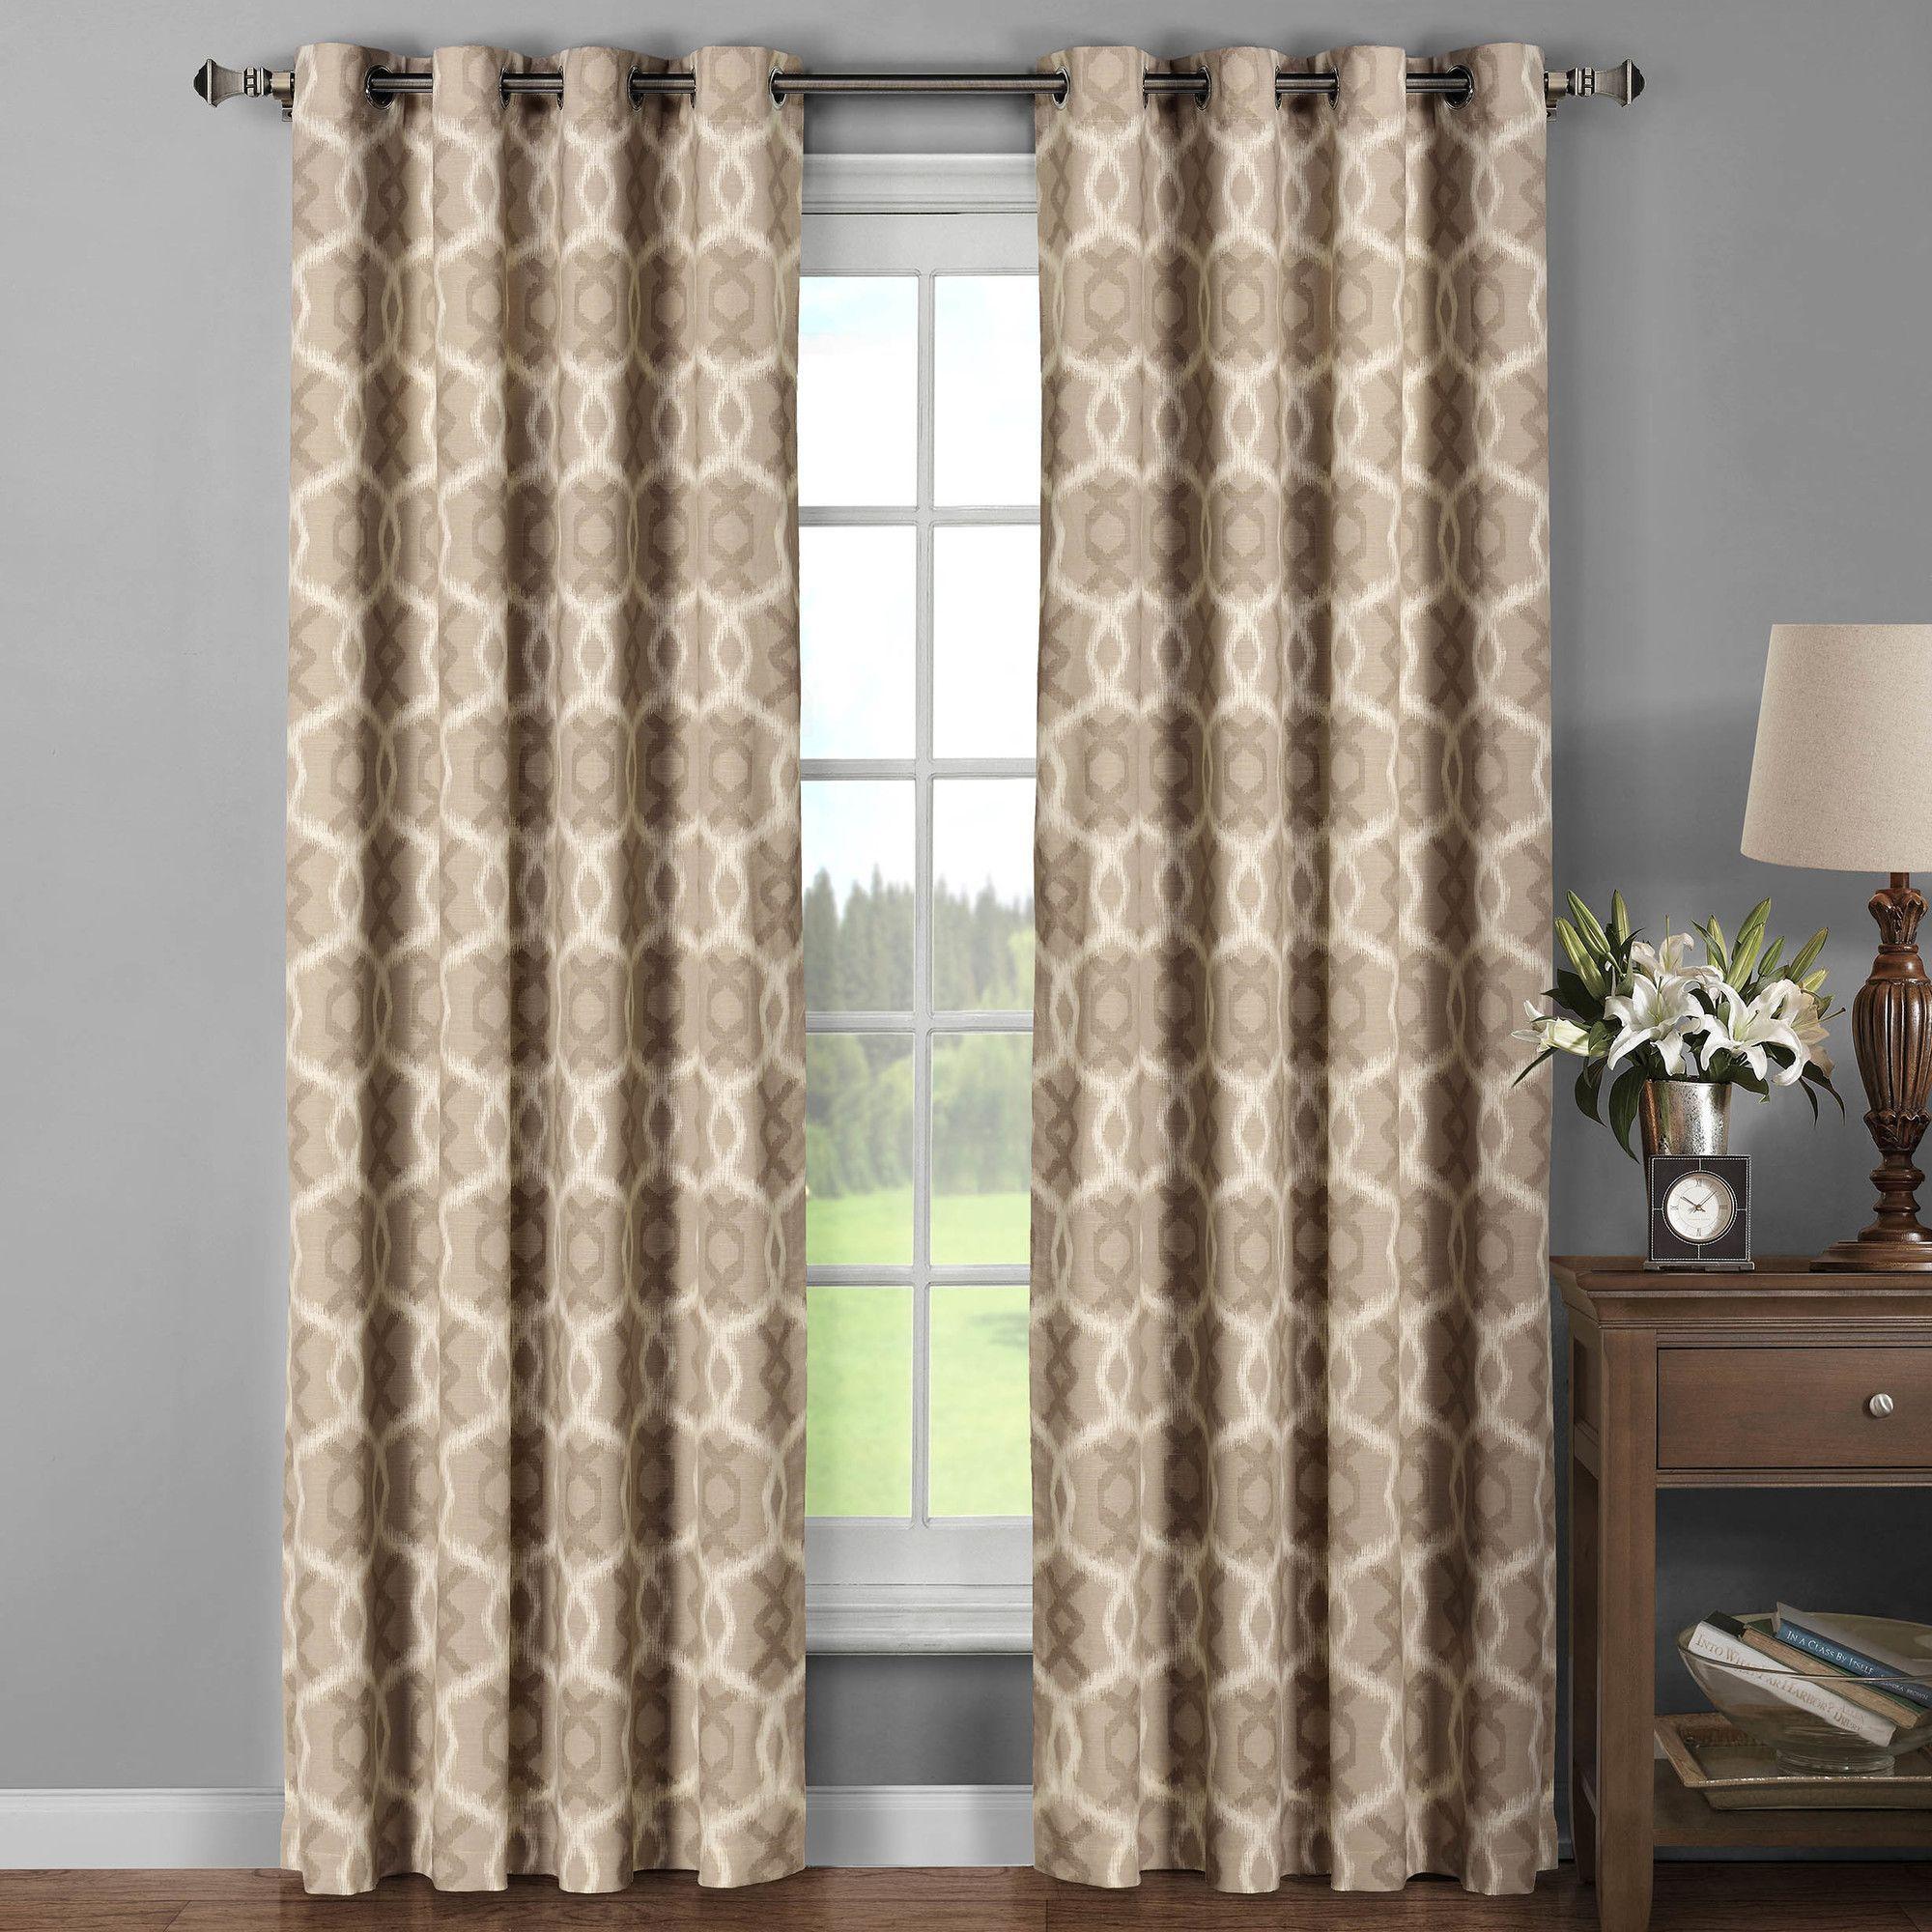 Avila Printed Cotton Extra Wide Grommet Curtain Panels  Extra Wide Curtain Panels